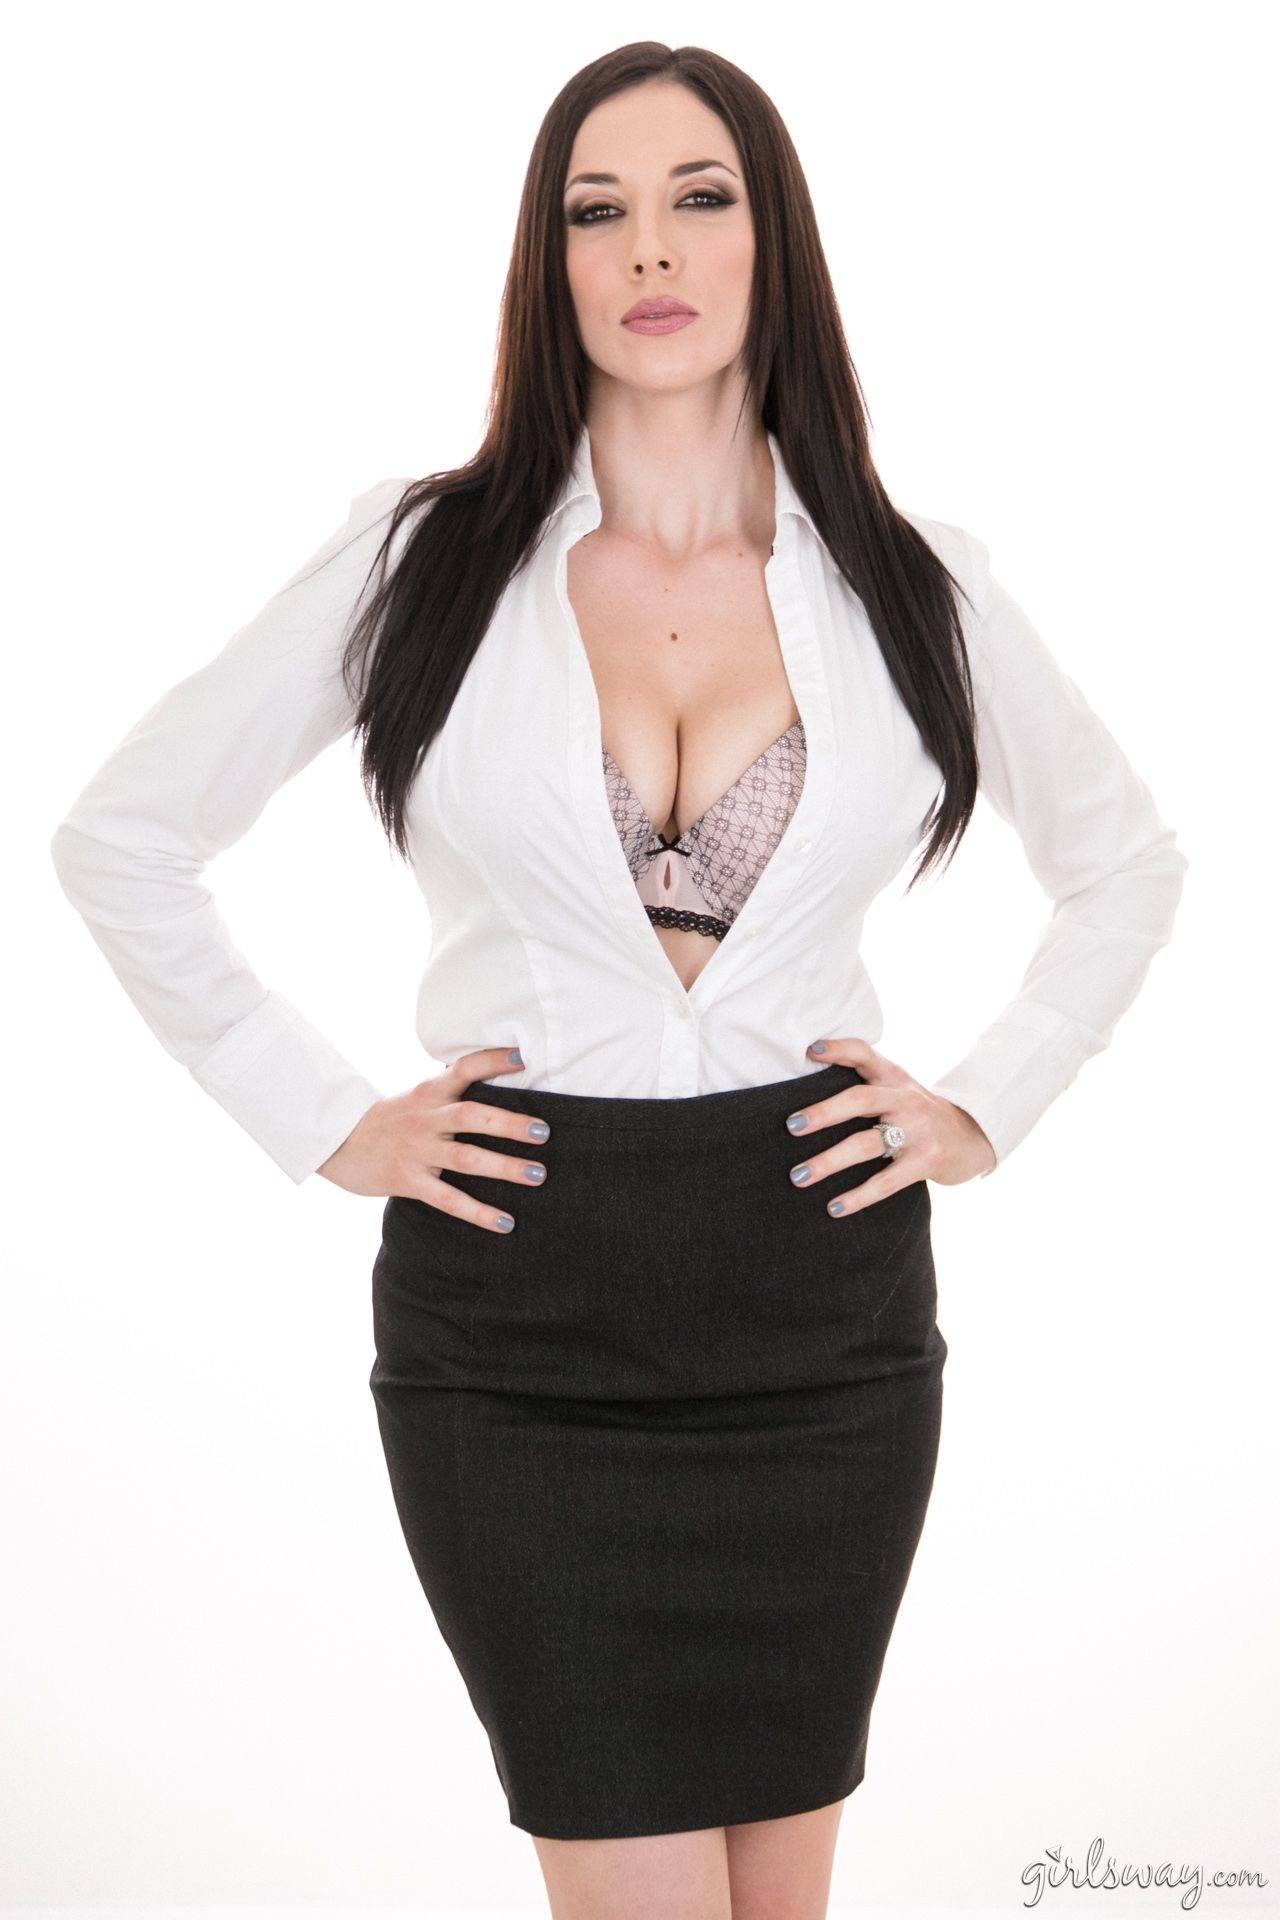 Jelena Jensen Joey Fisher Sweet Girls Secretary White Shirts Curves Display